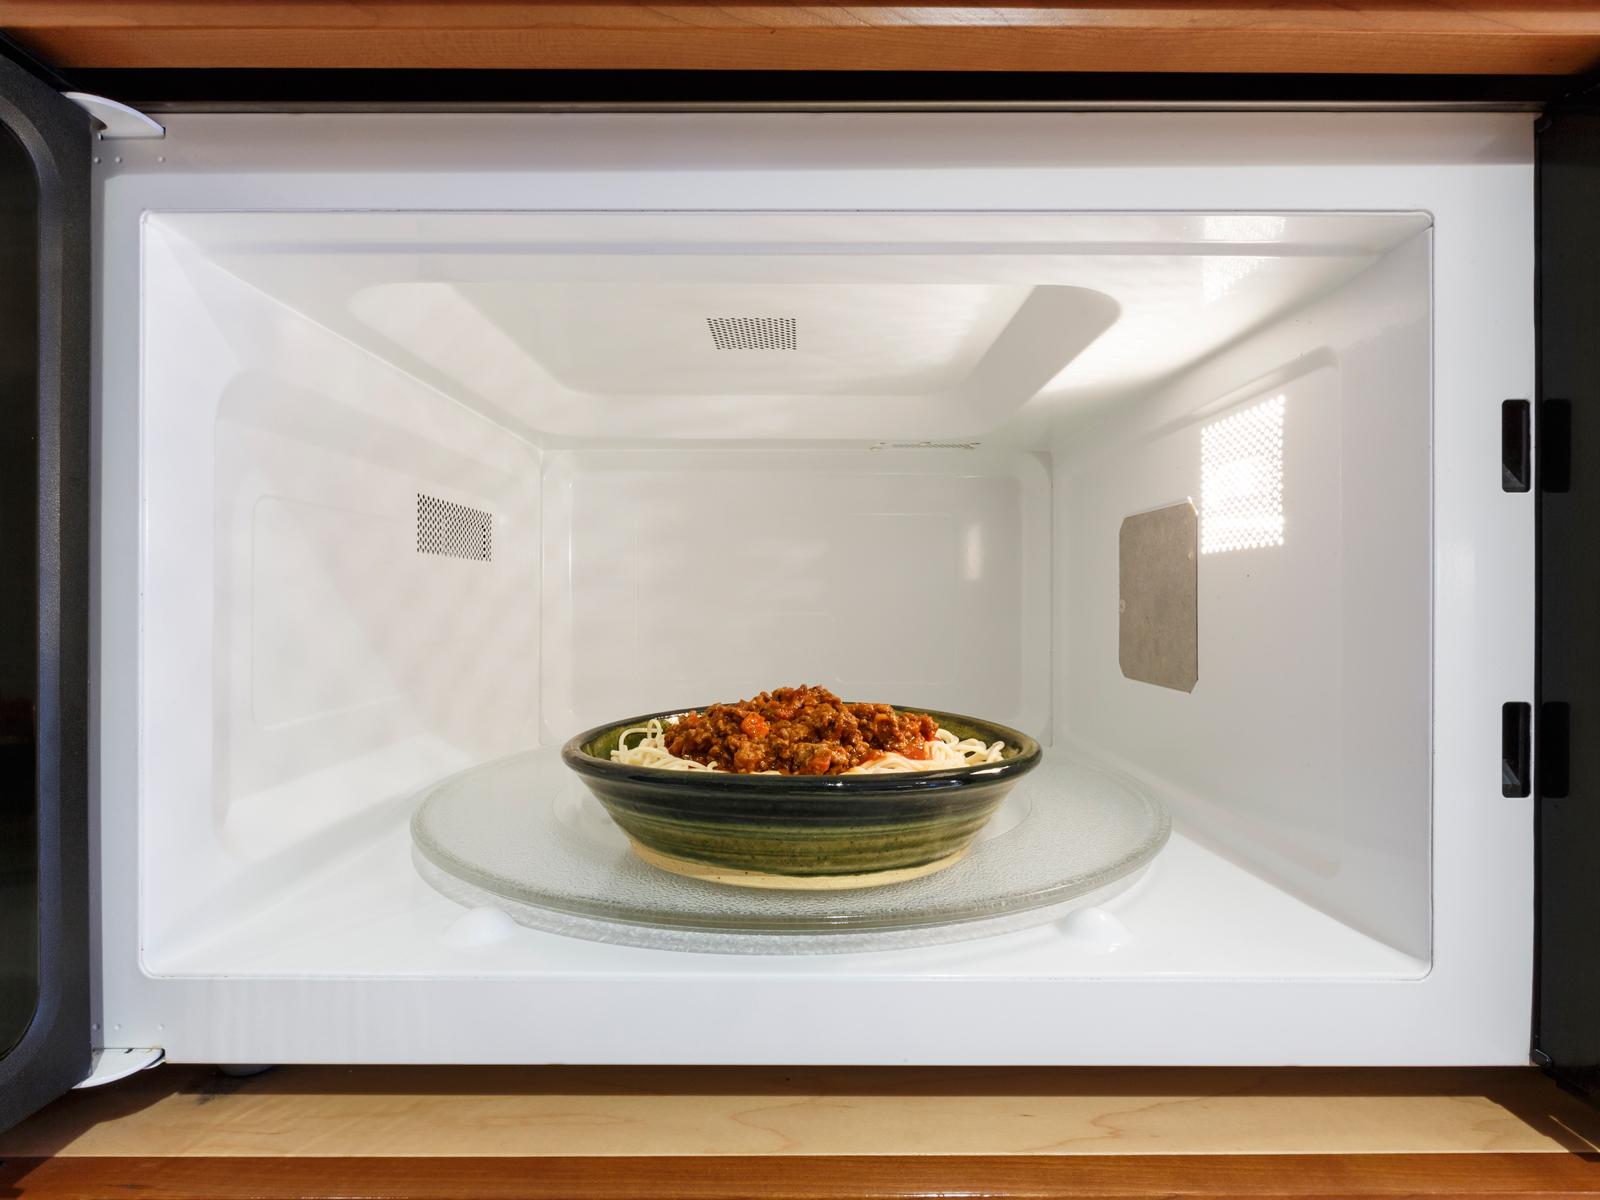 Amazon to Release Its Own Alexa-Enhanced Microwave